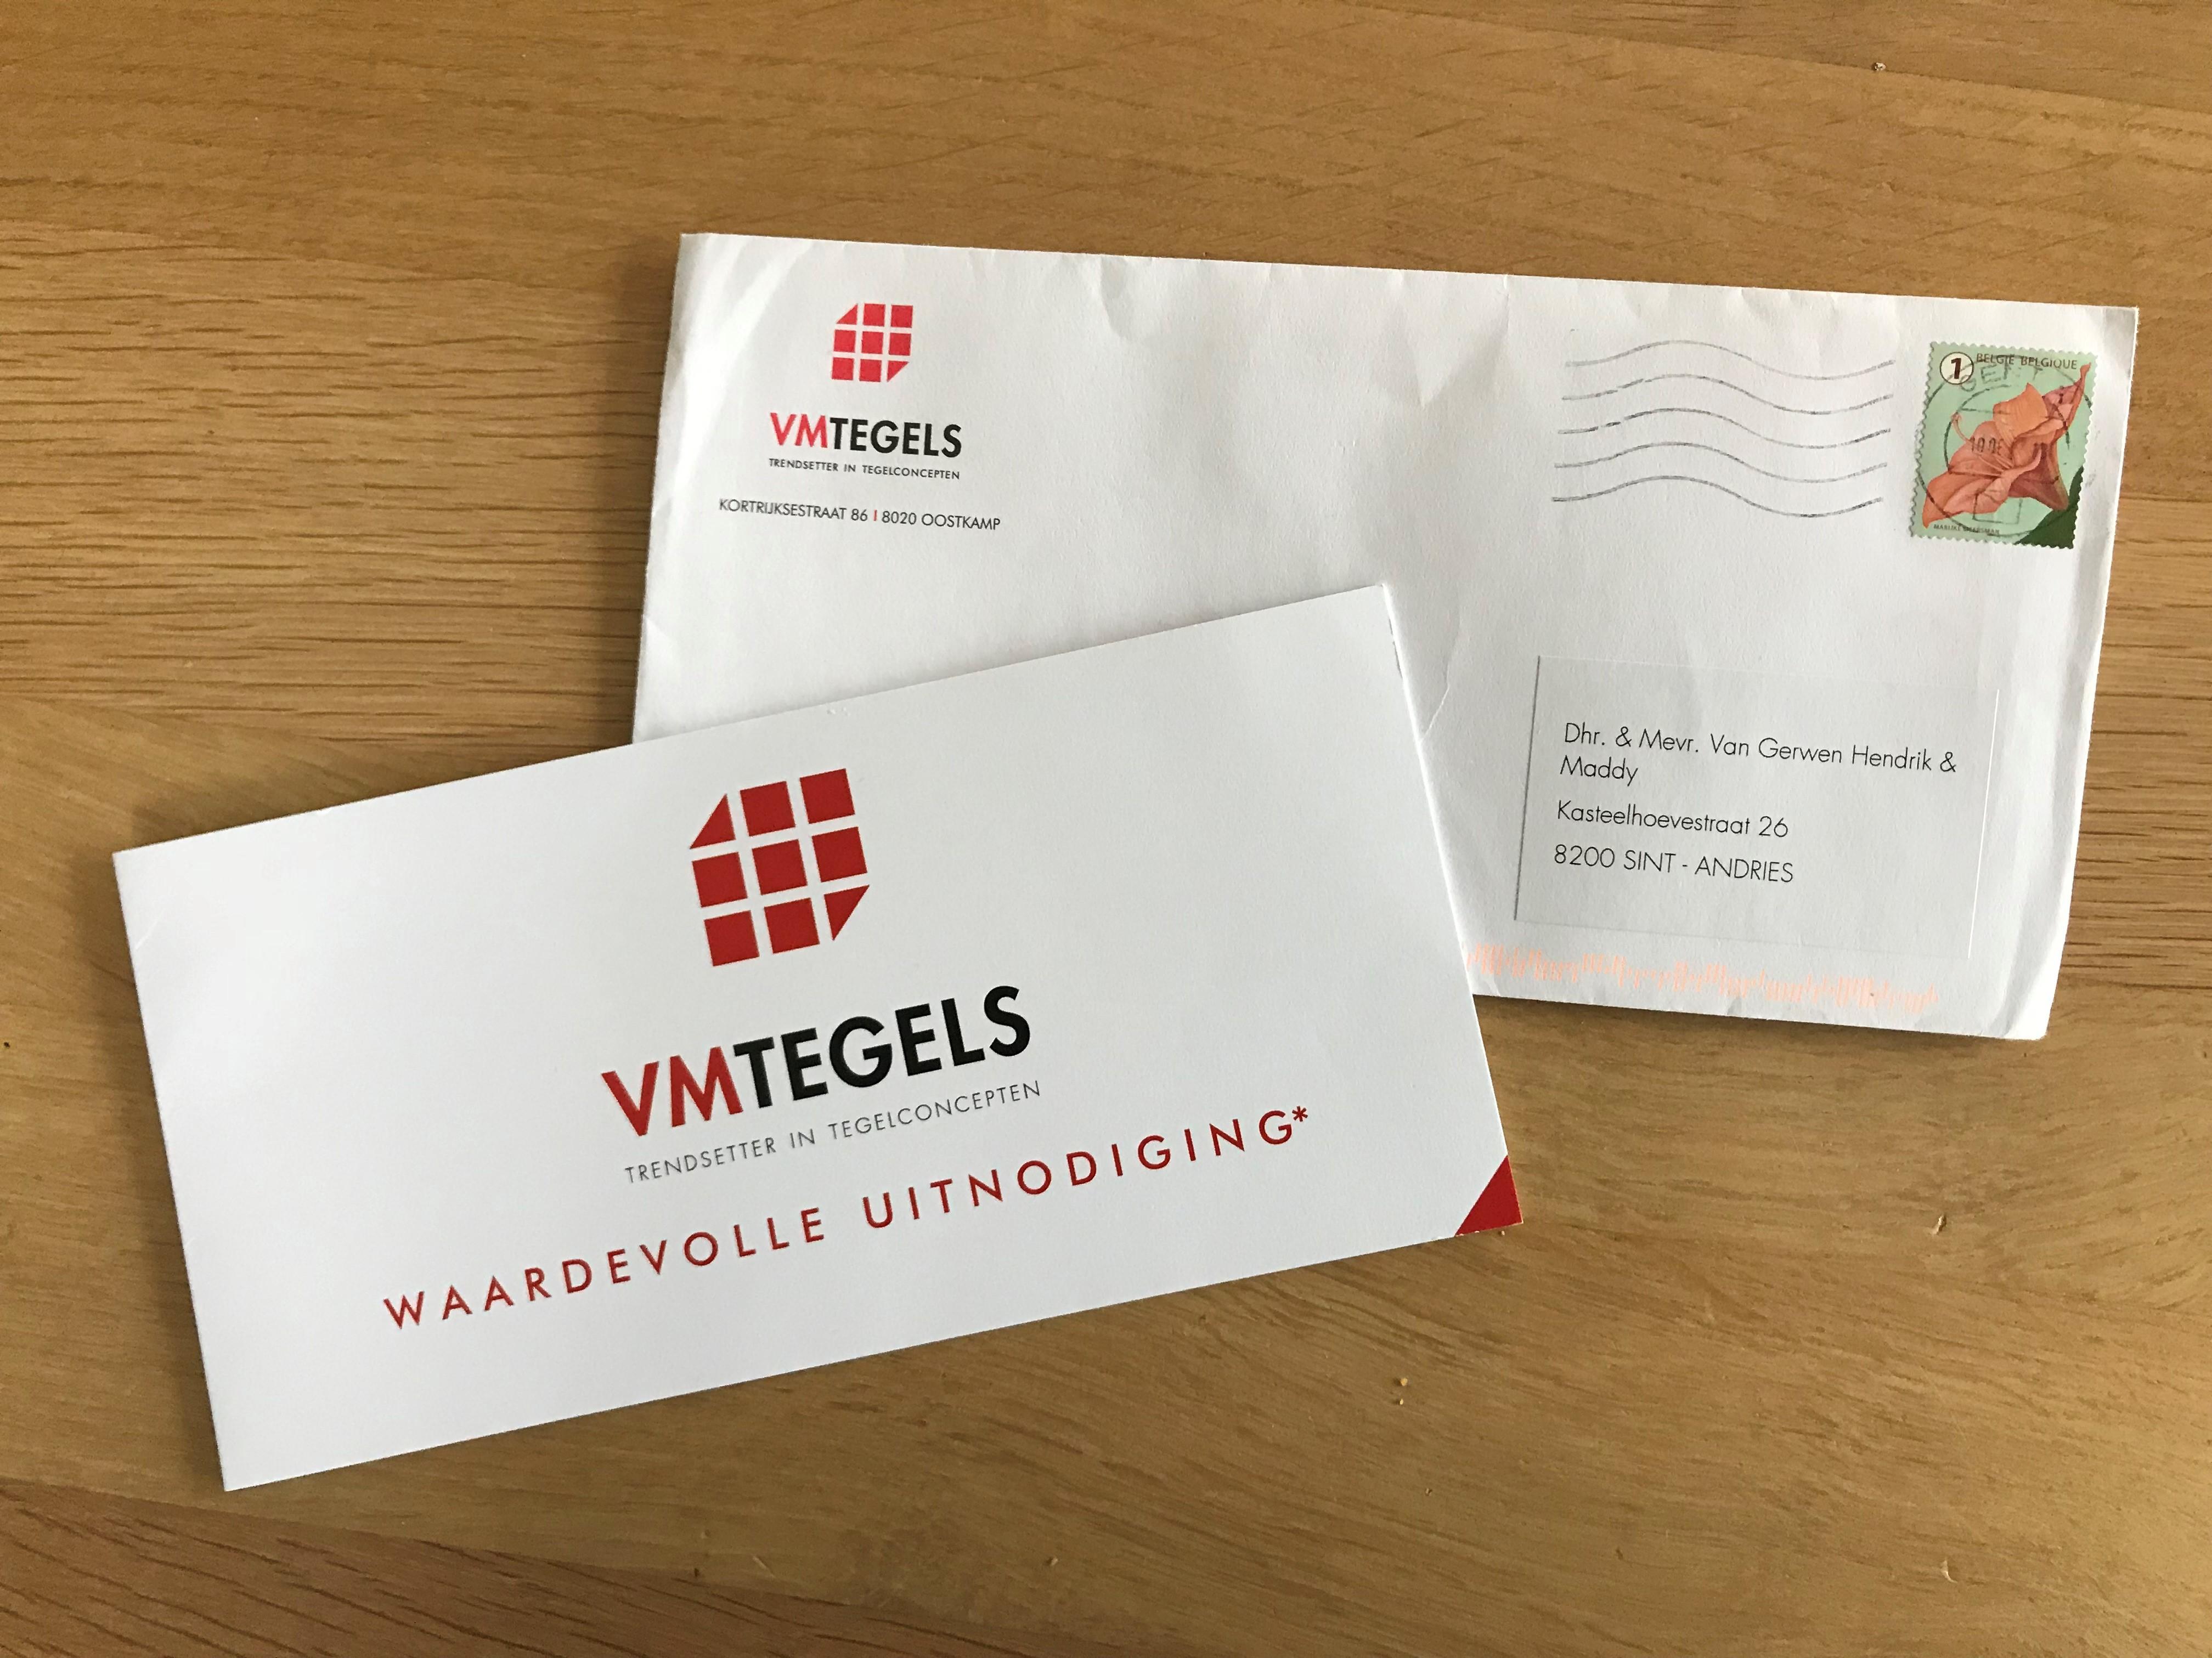 vm-tegels-customer-journey-direct-mail-2